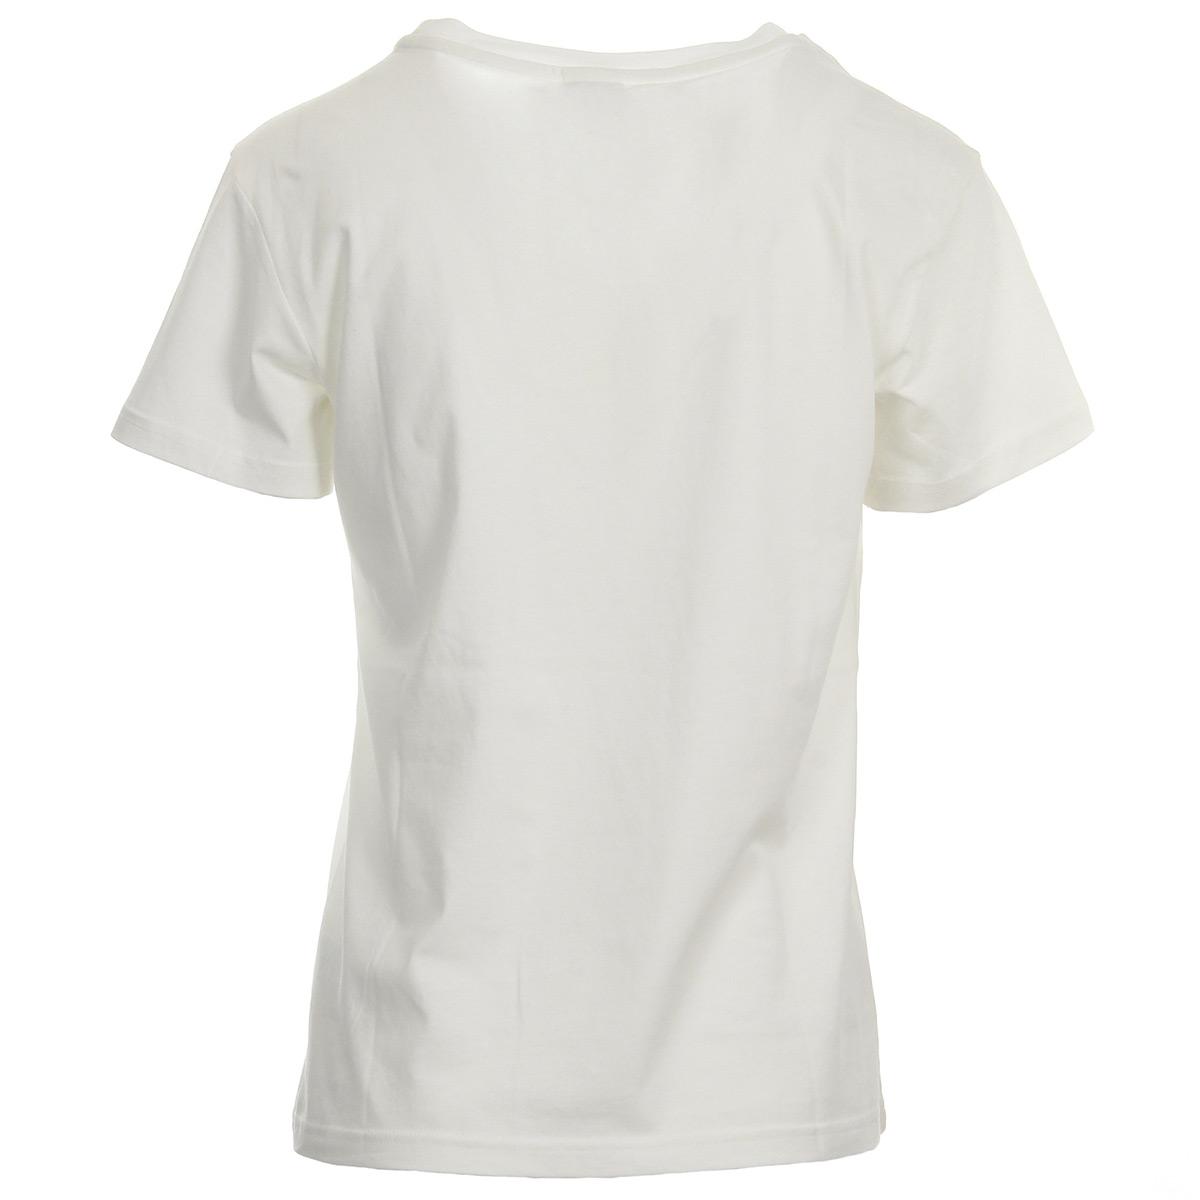 Puma Archive Tee 57128632, T-Shirts femme